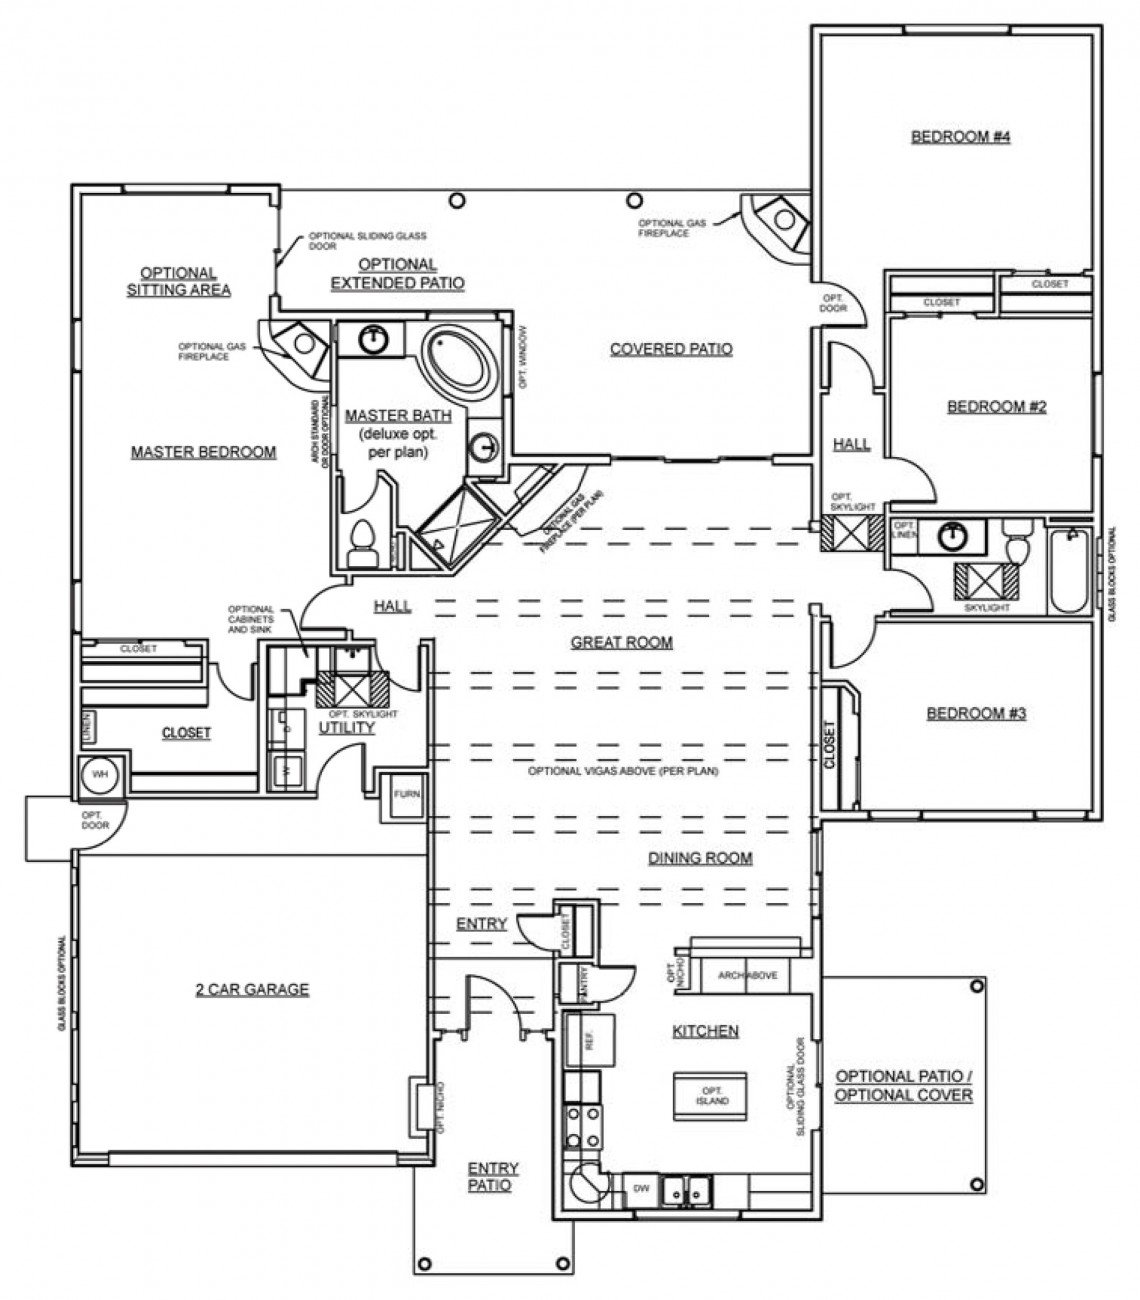 Pink Moon Floorplan - 2,110 sq ft